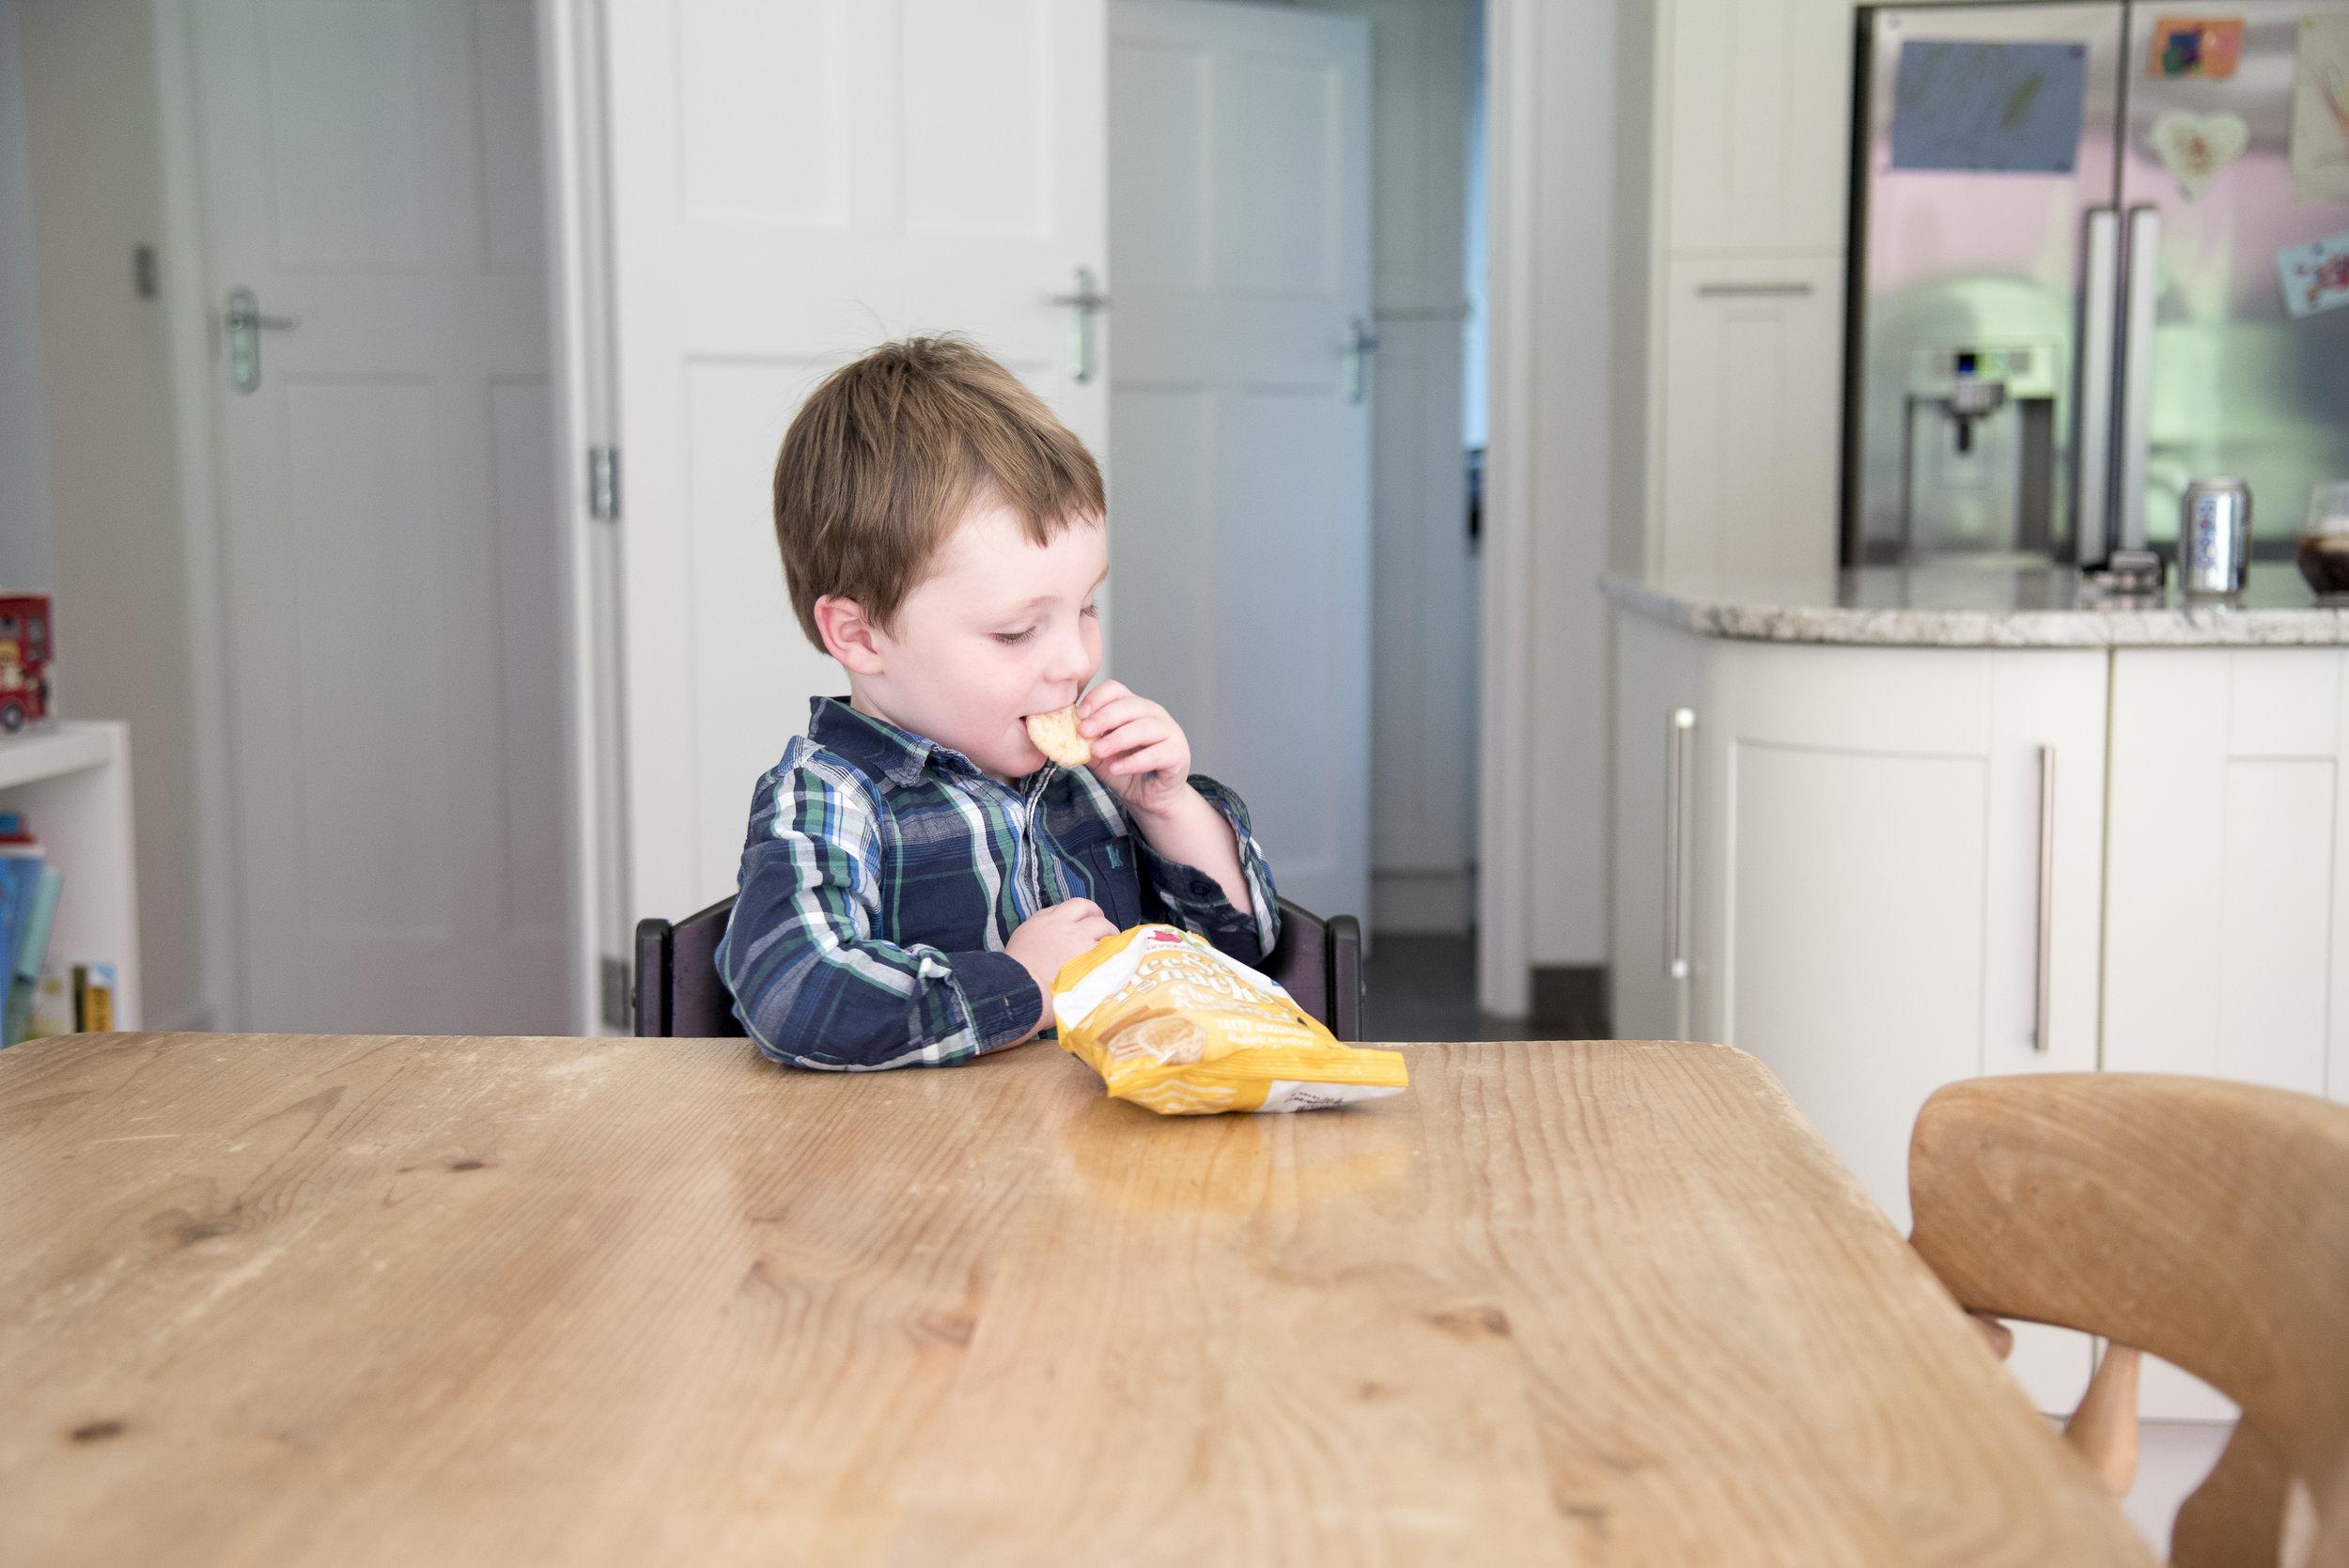 sally-hornung-photography-boy-eating-crisps-table.jpg